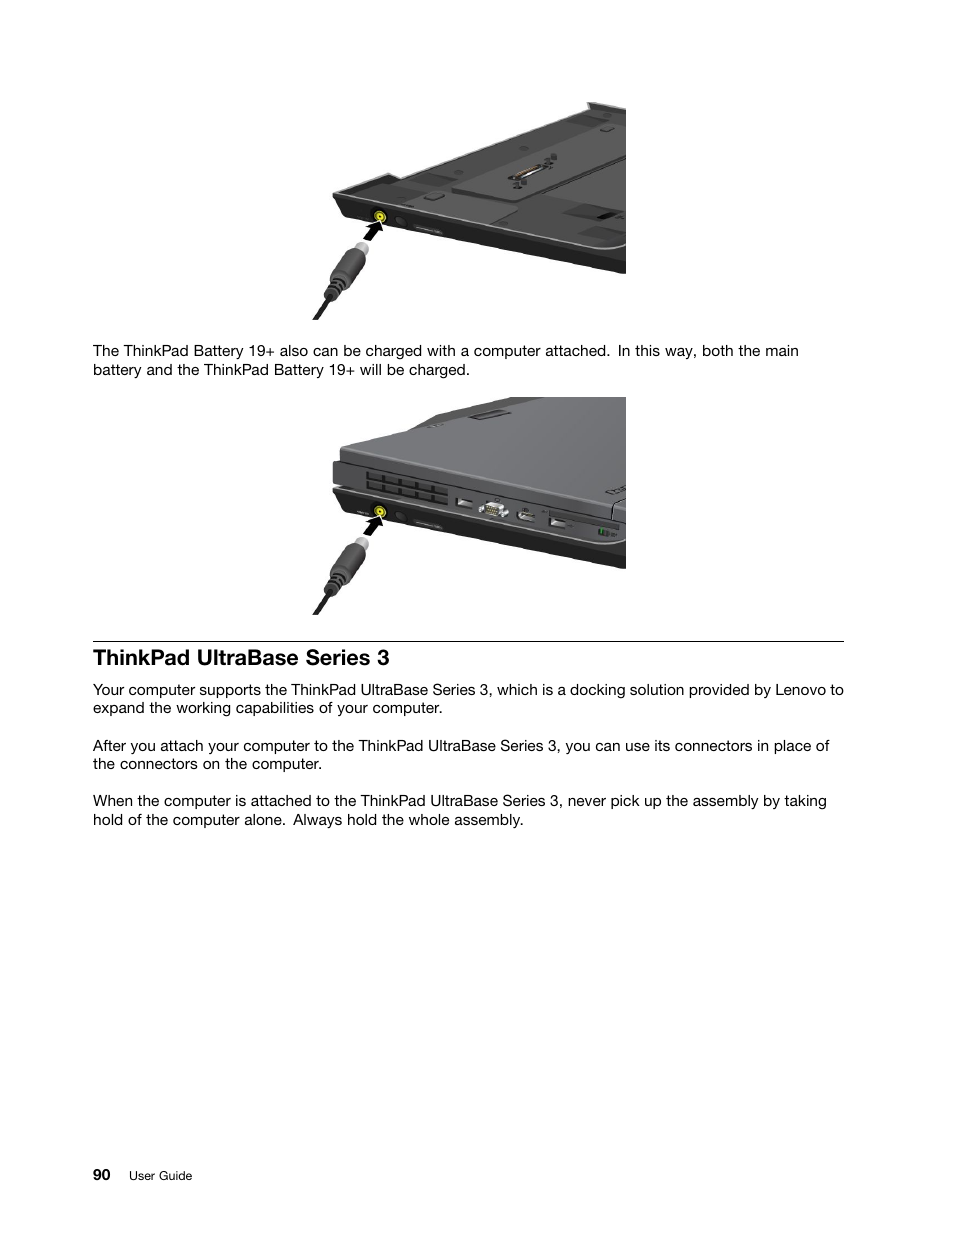 thinkpad ultrabase series 3 lenovo x230 user manual page 108 185 rh manualsdir com lenovo x230 user manual lenovo x250 user guide